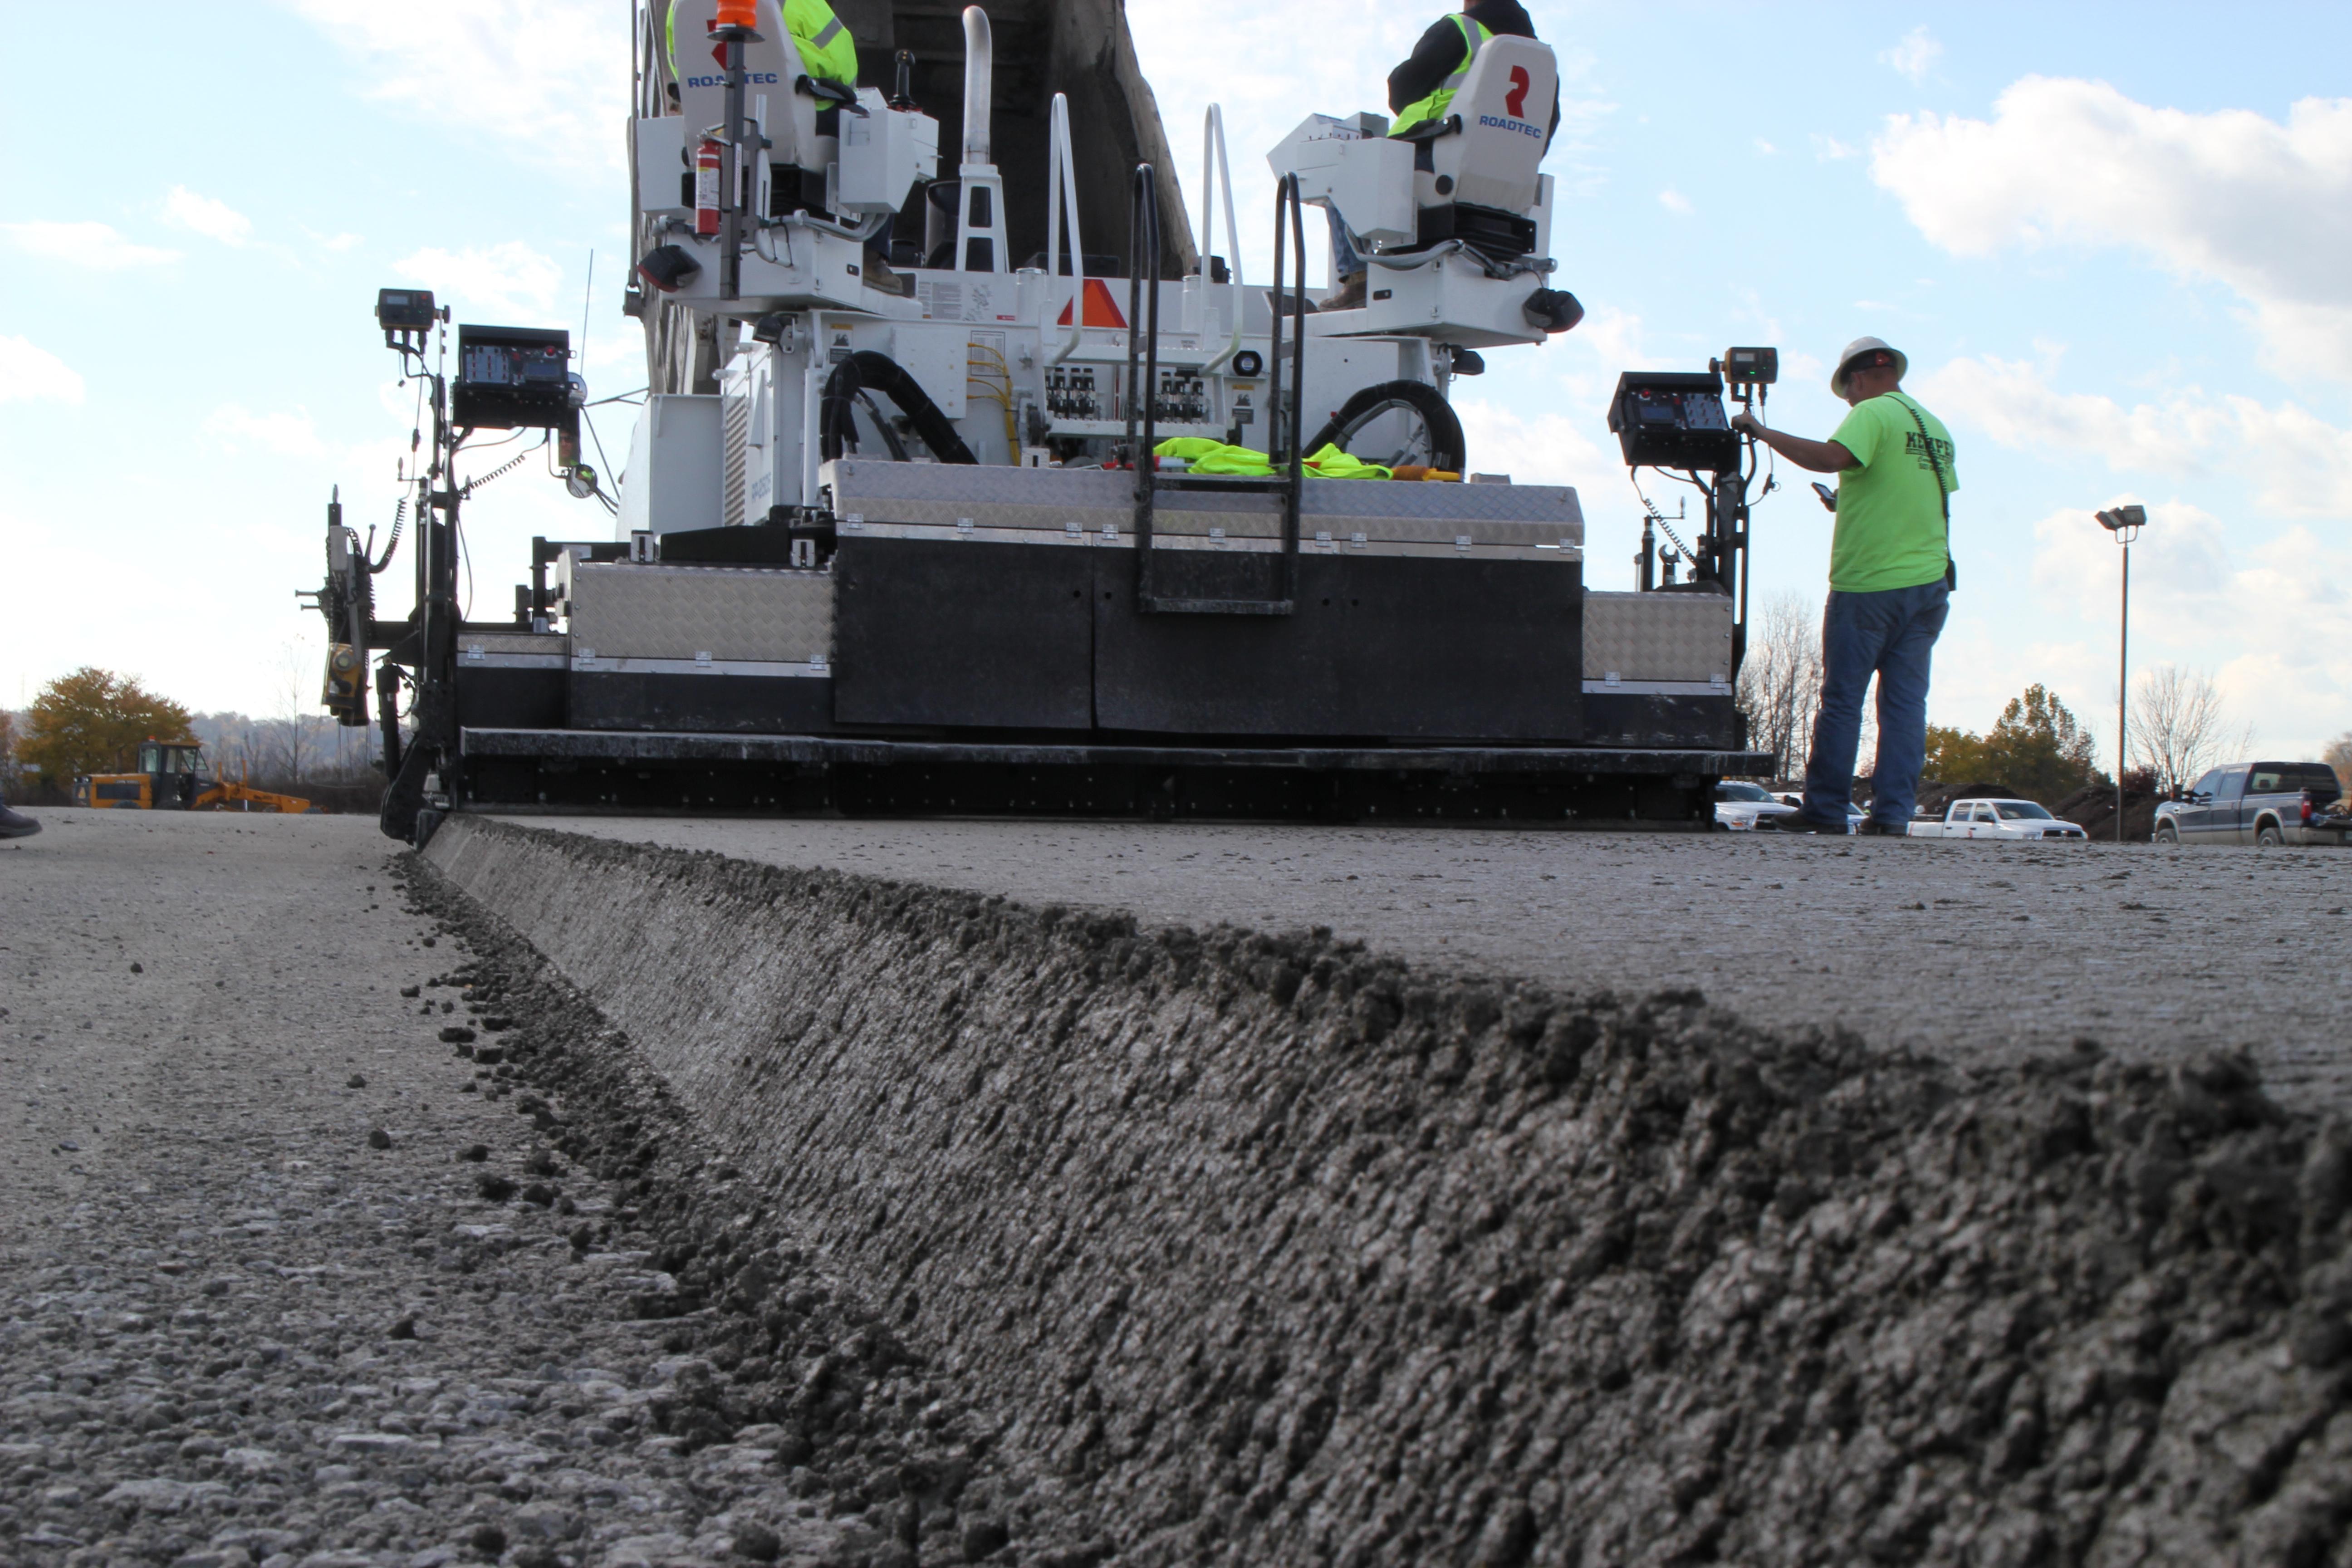 Roller Compacted Concrete Equipment : Roller compacted concrete kemper construction llc